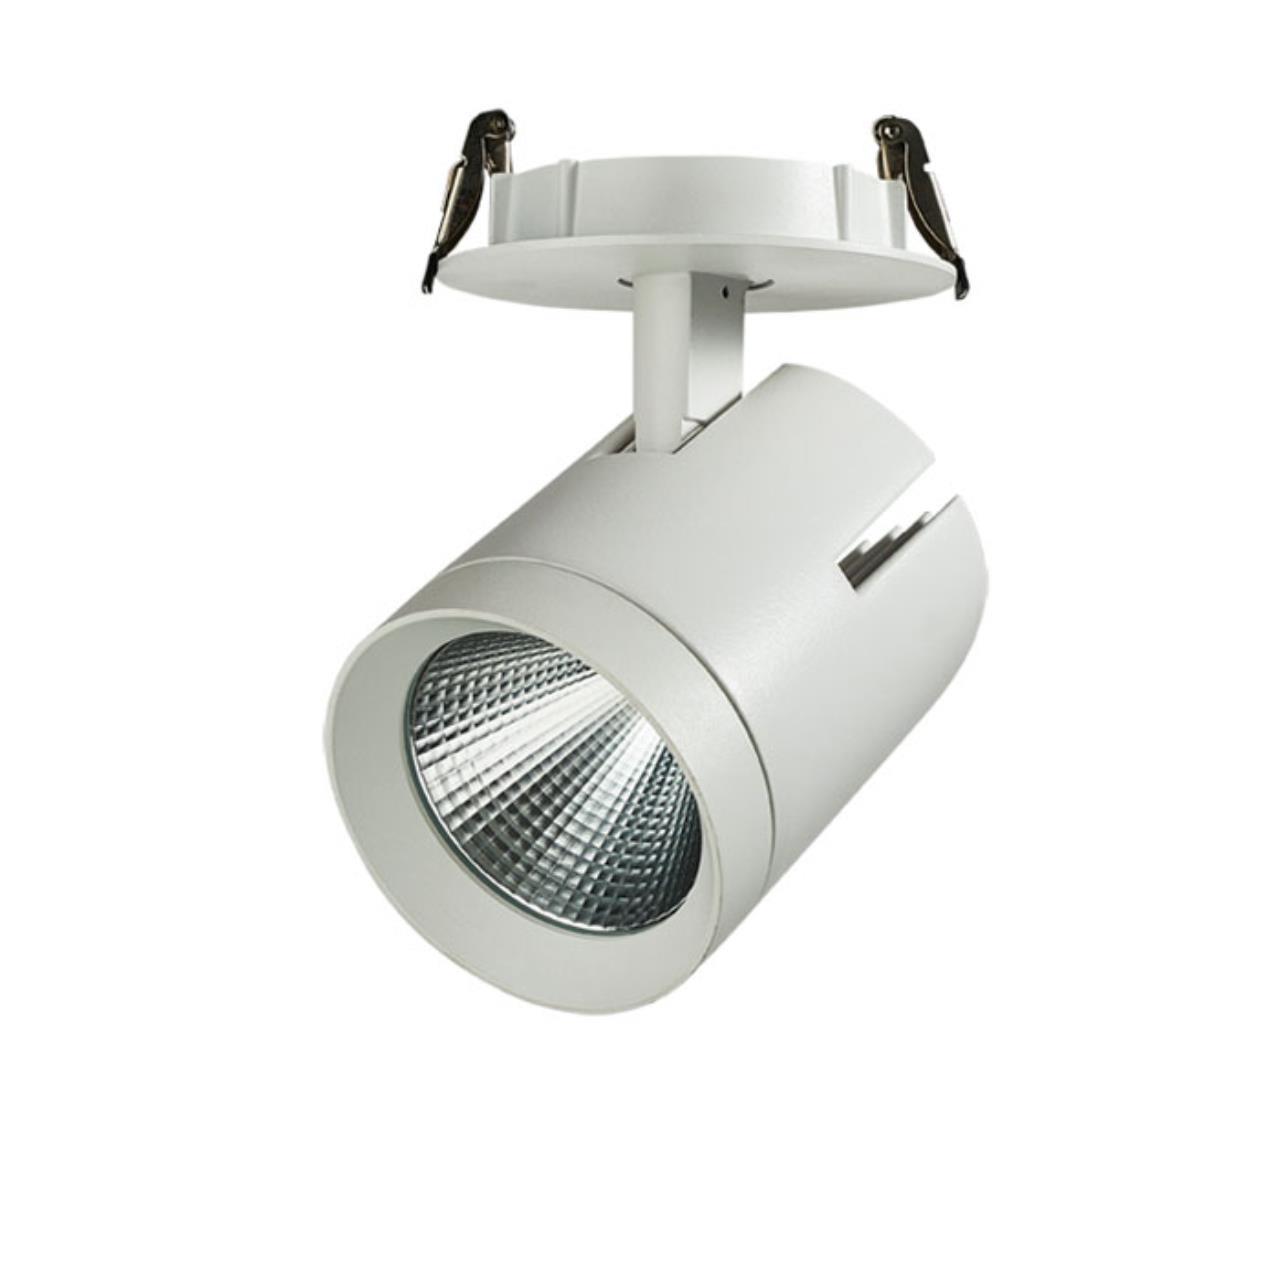 357542 SPOT NT18 055 белый Встраиваемый светильник IP20 LED 3000K 40W 220-240V SEALS